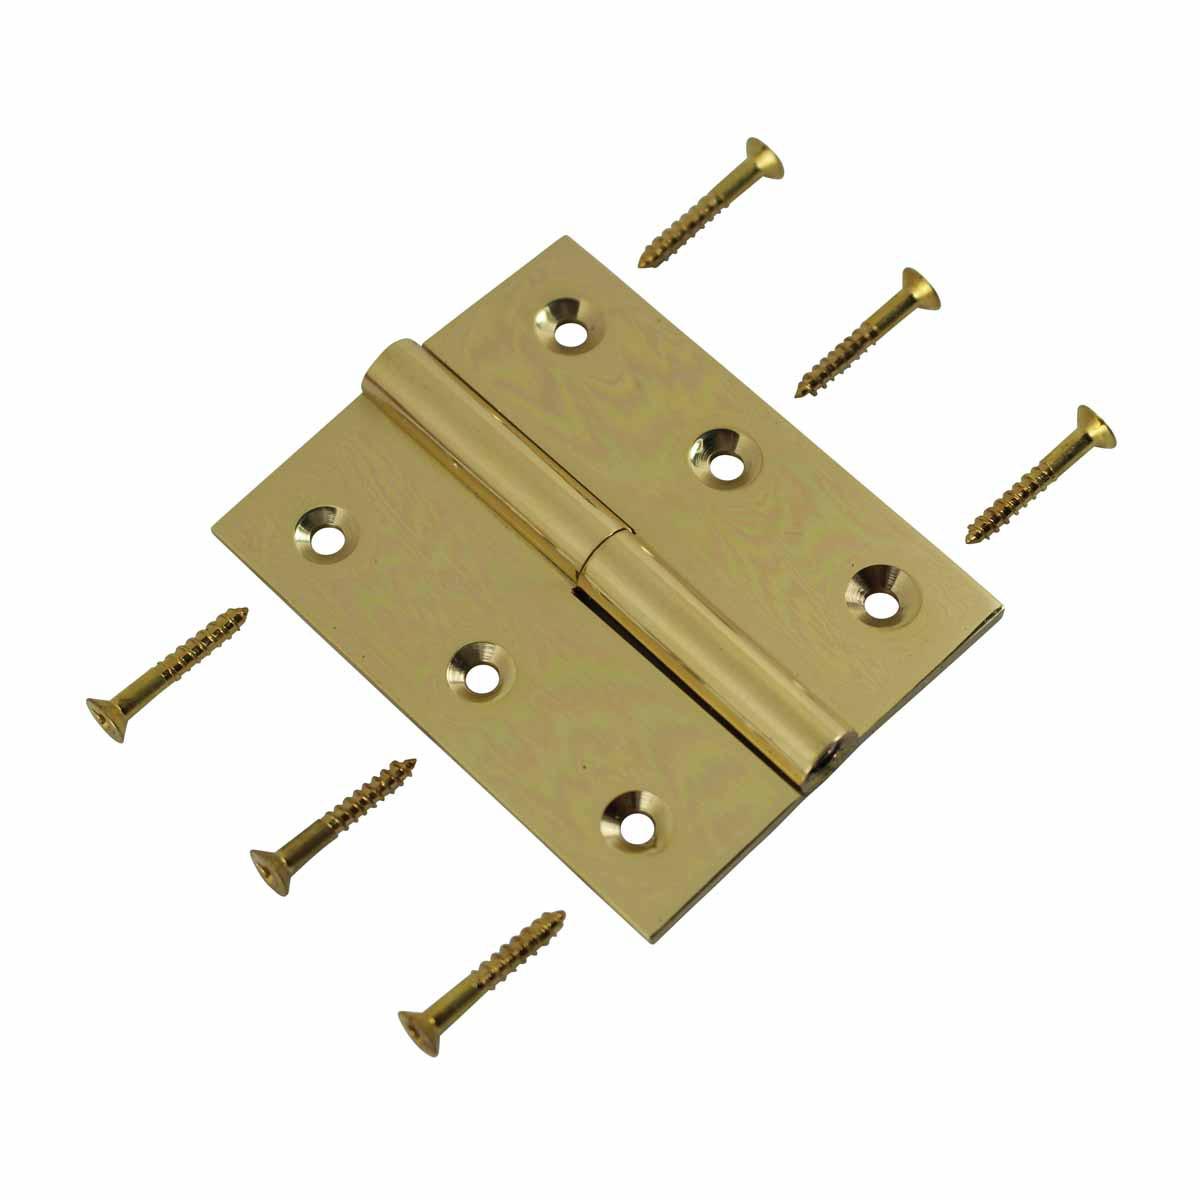 Cabinet Hinge Solid Brass Square LOR 2 x 2.5 Door Hinges Door Hinge Solid Brass Hinge